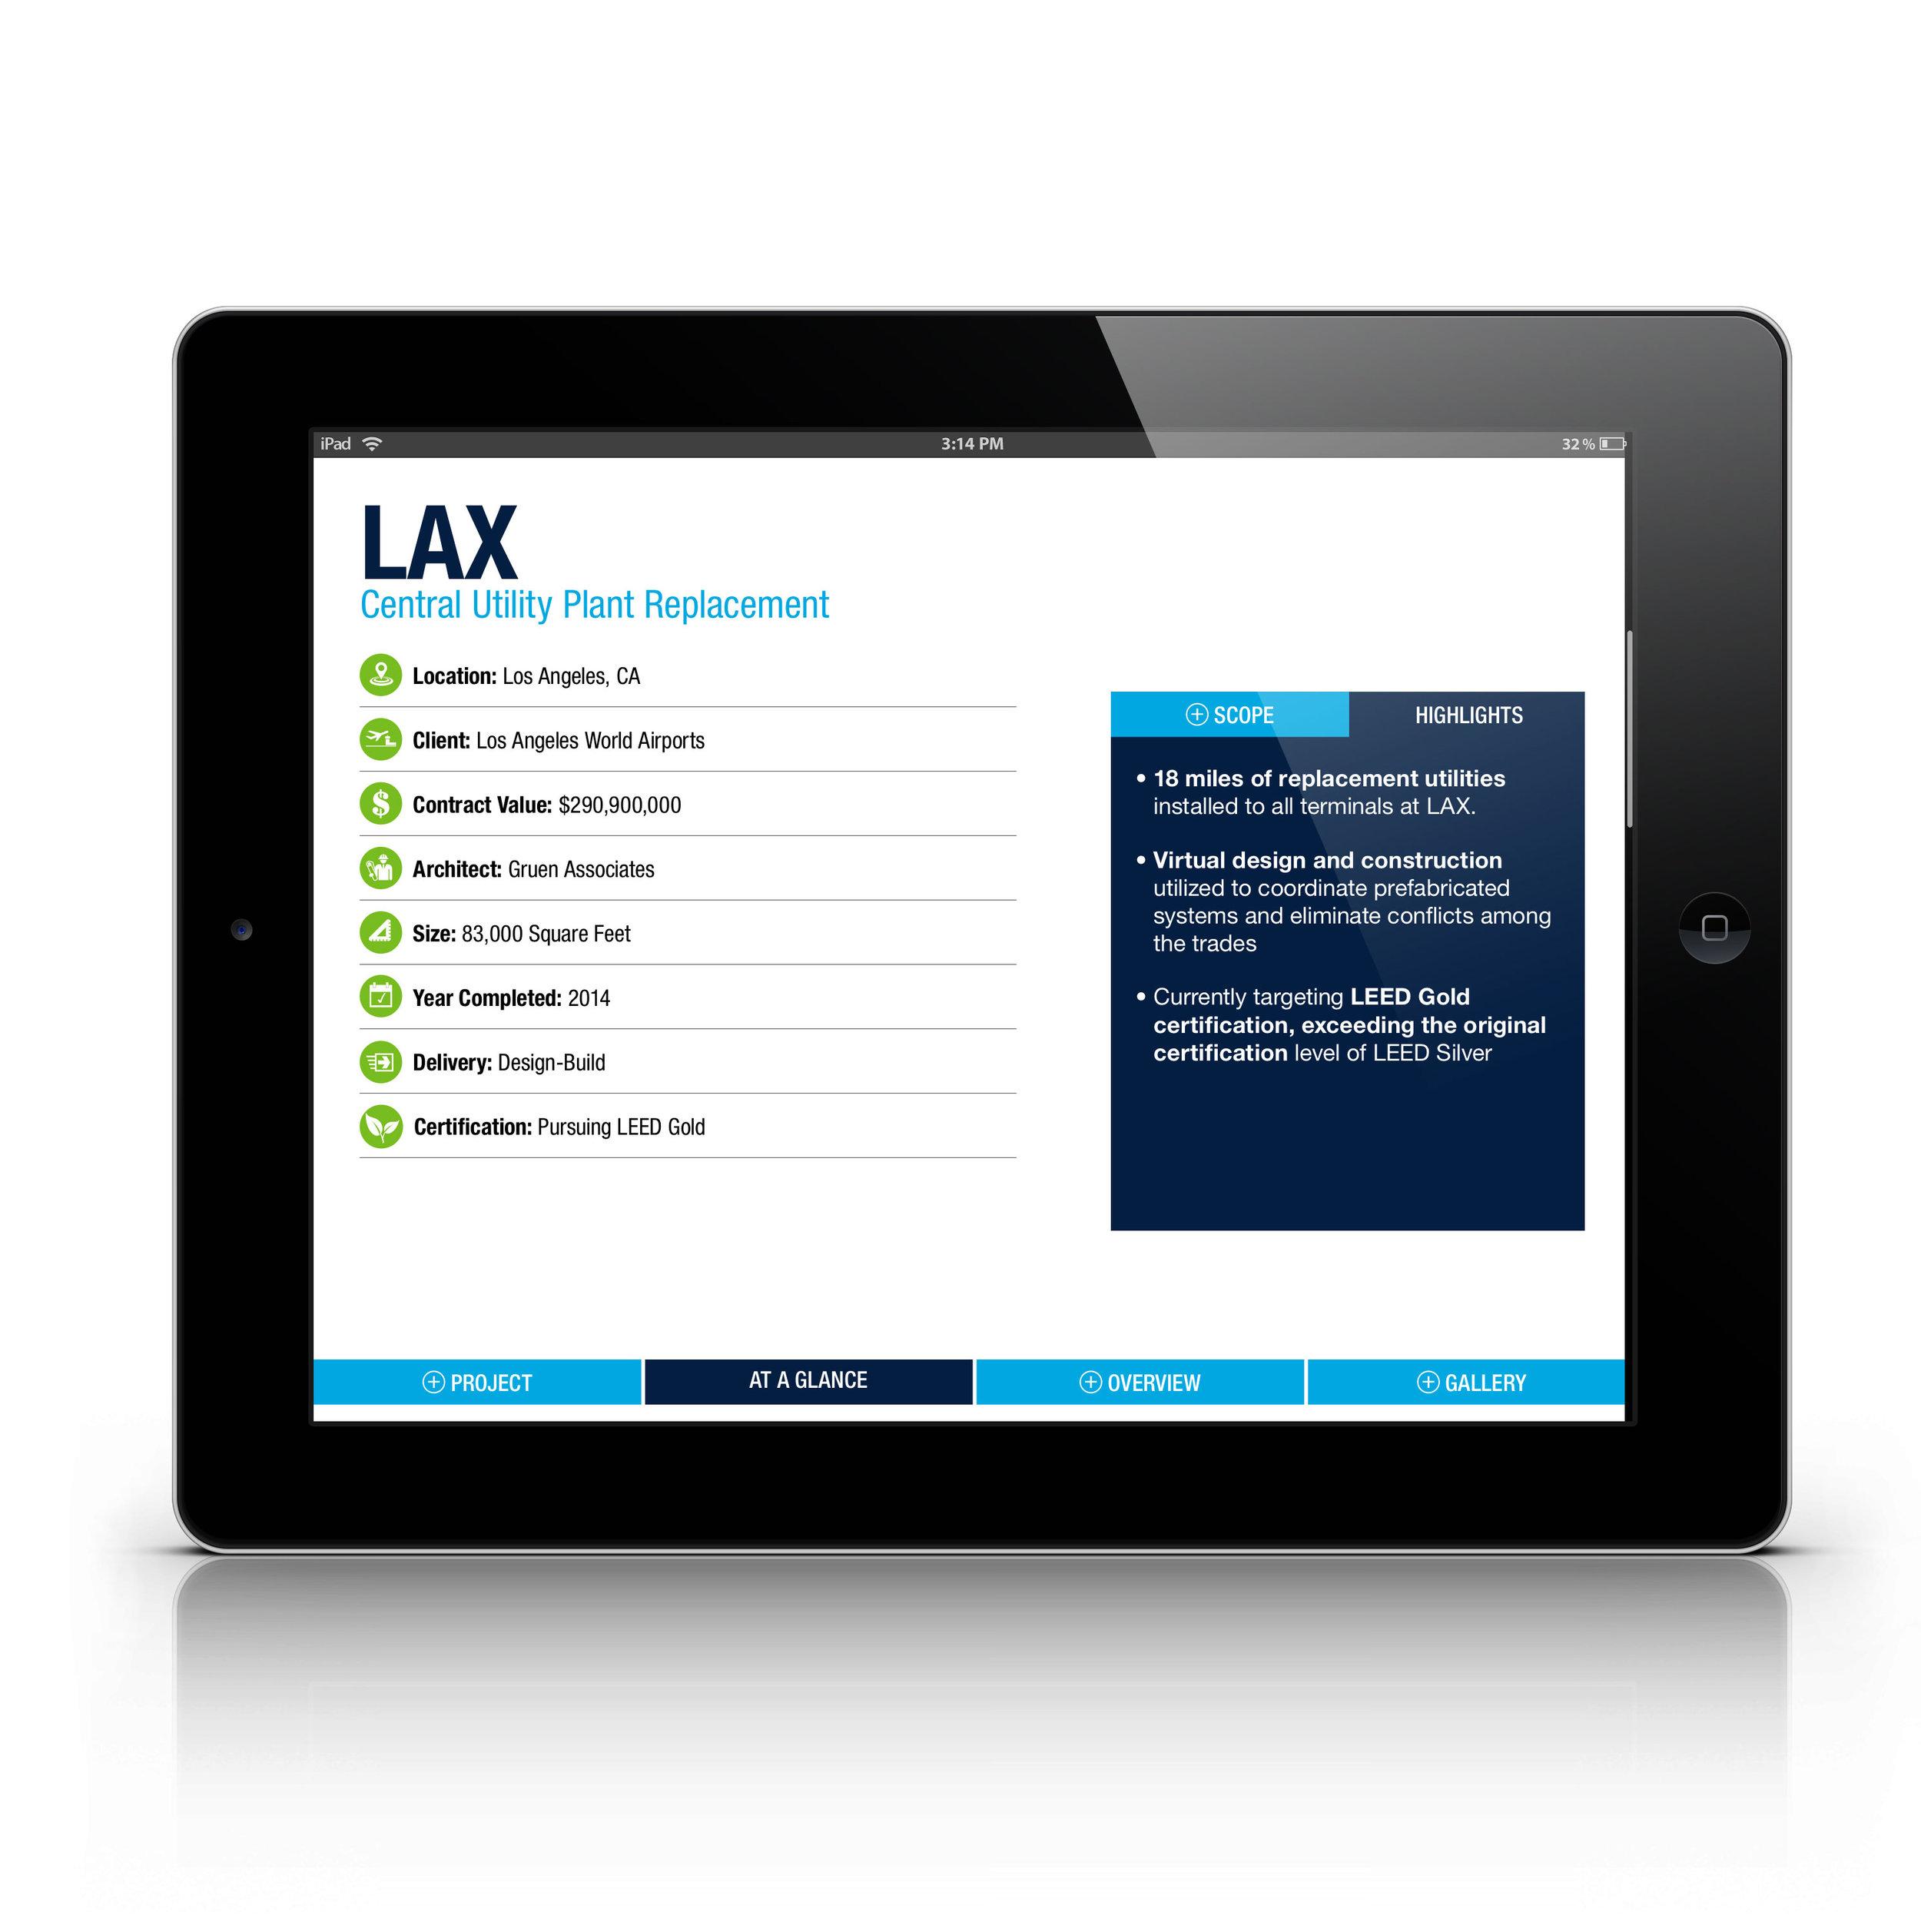 8clark-iPad-Landscape-Retina-Display-Mockup.jpg